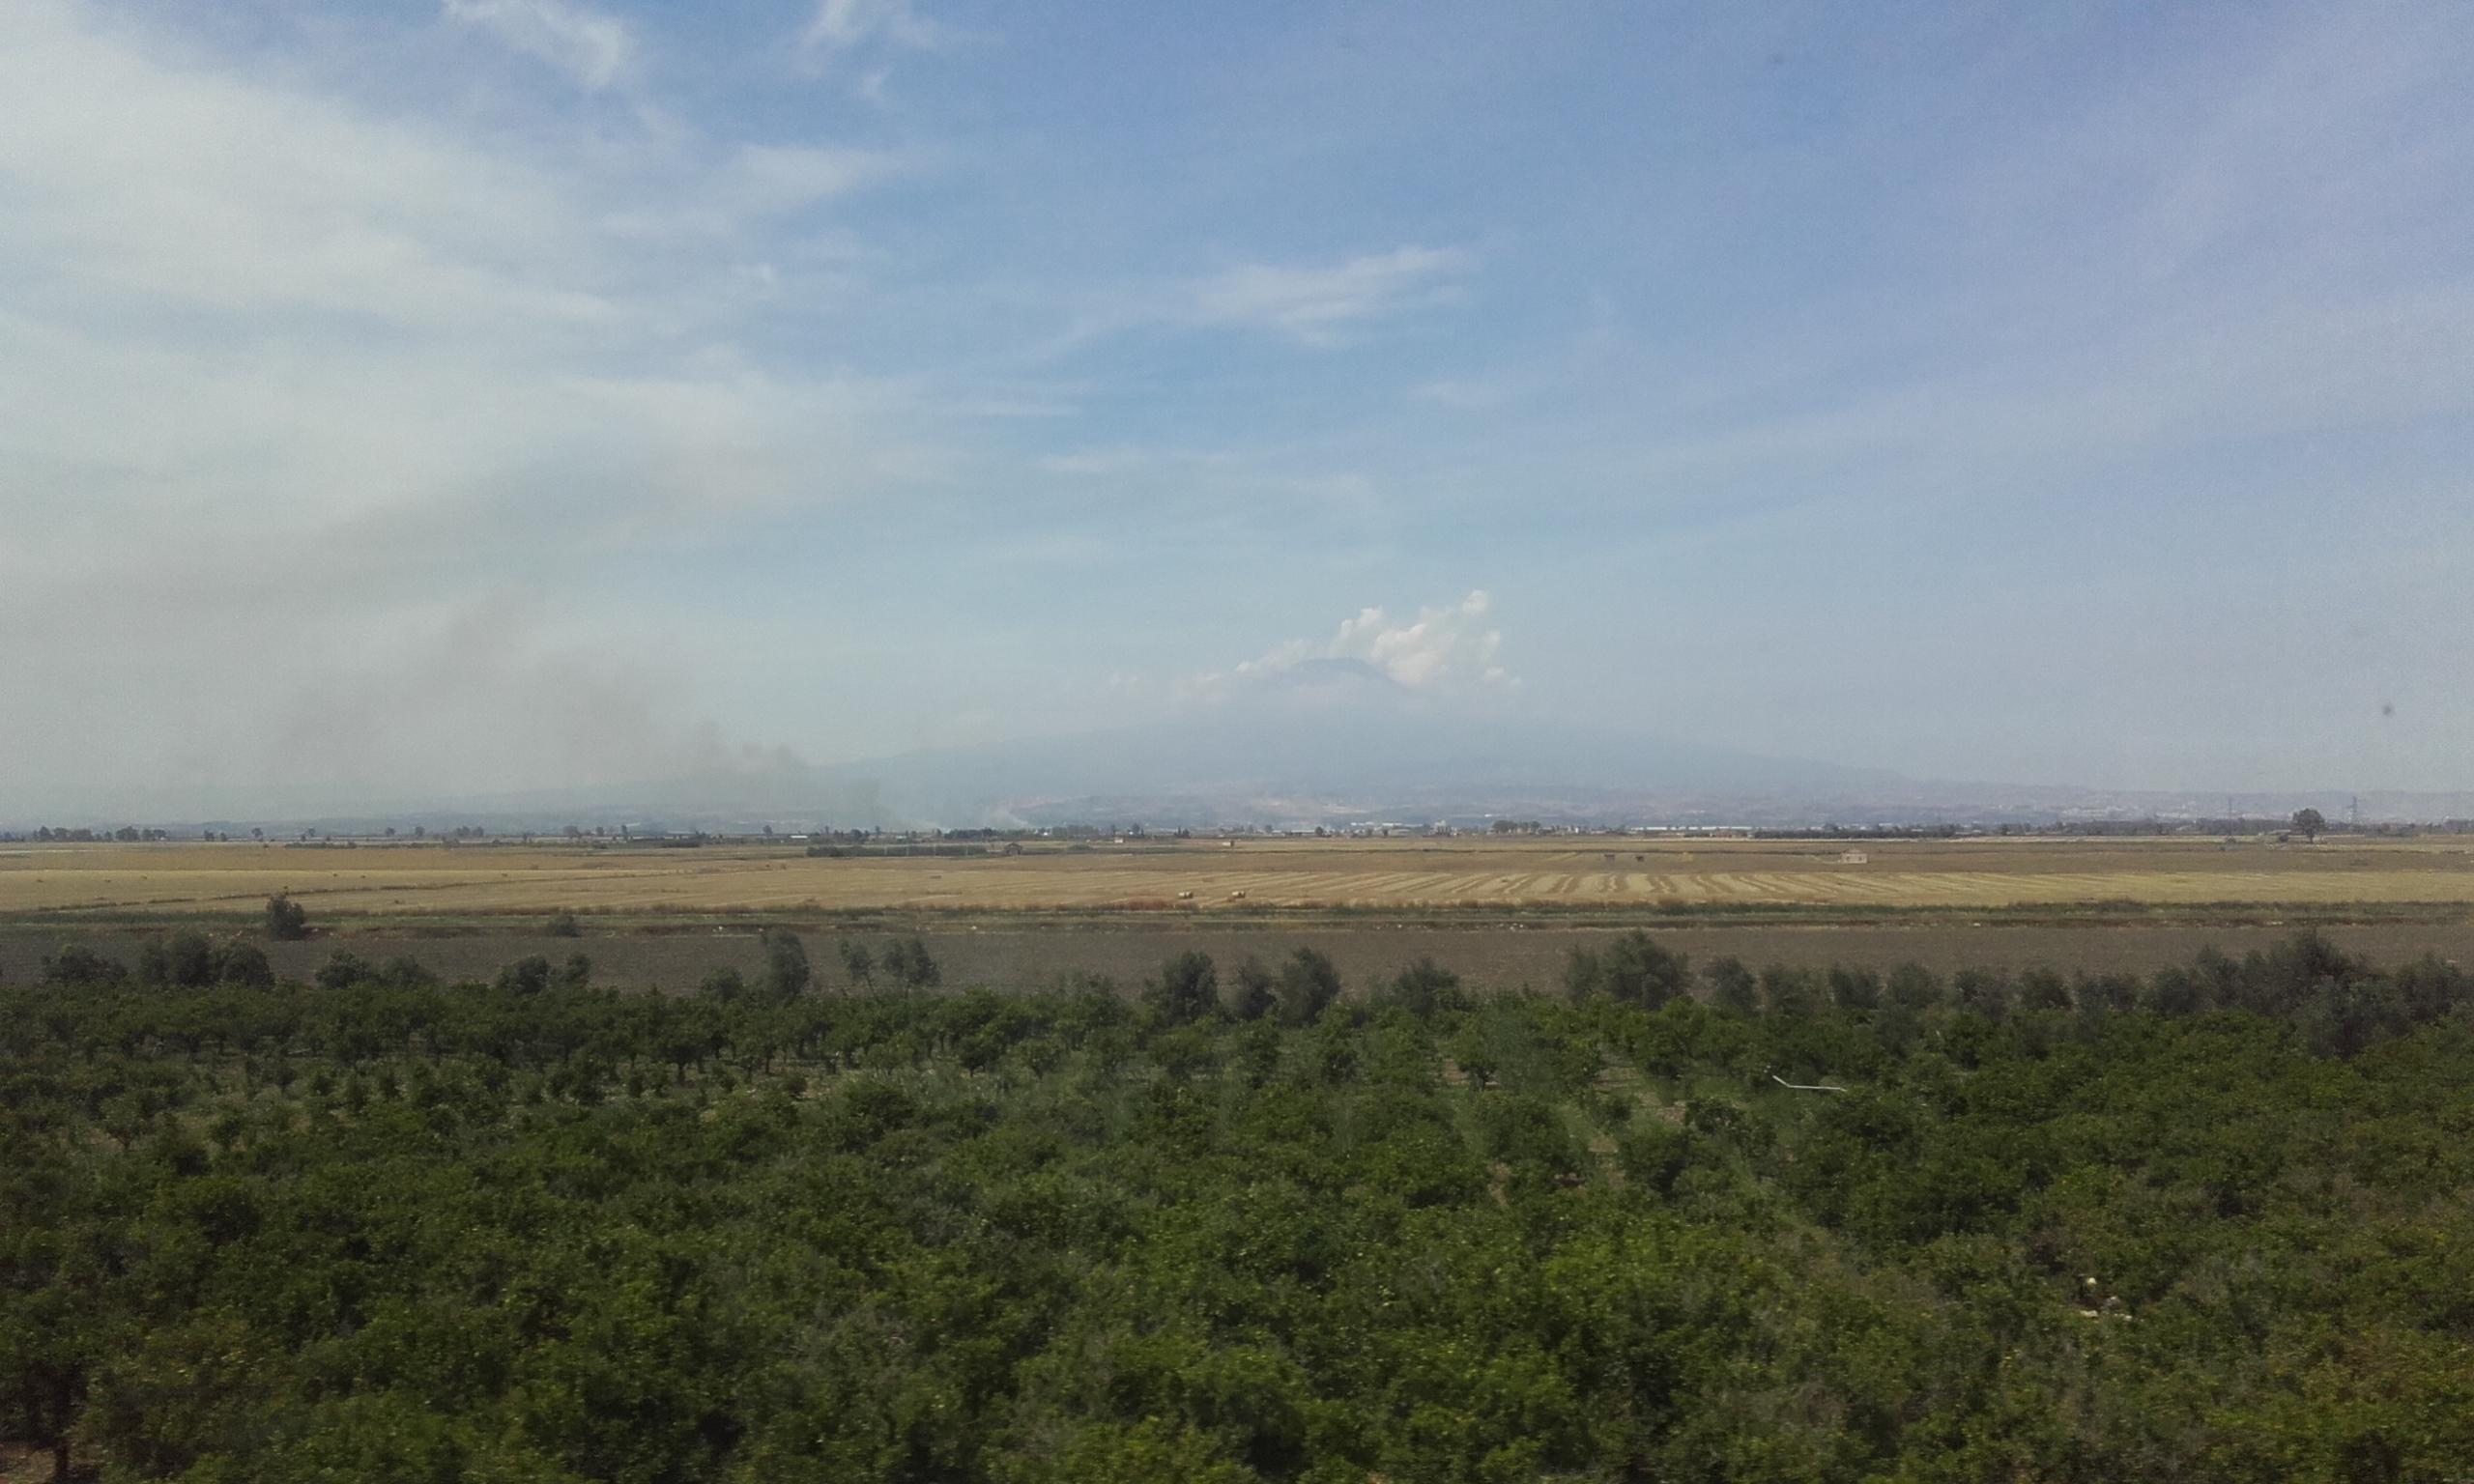 El volcán Etna desde el tren